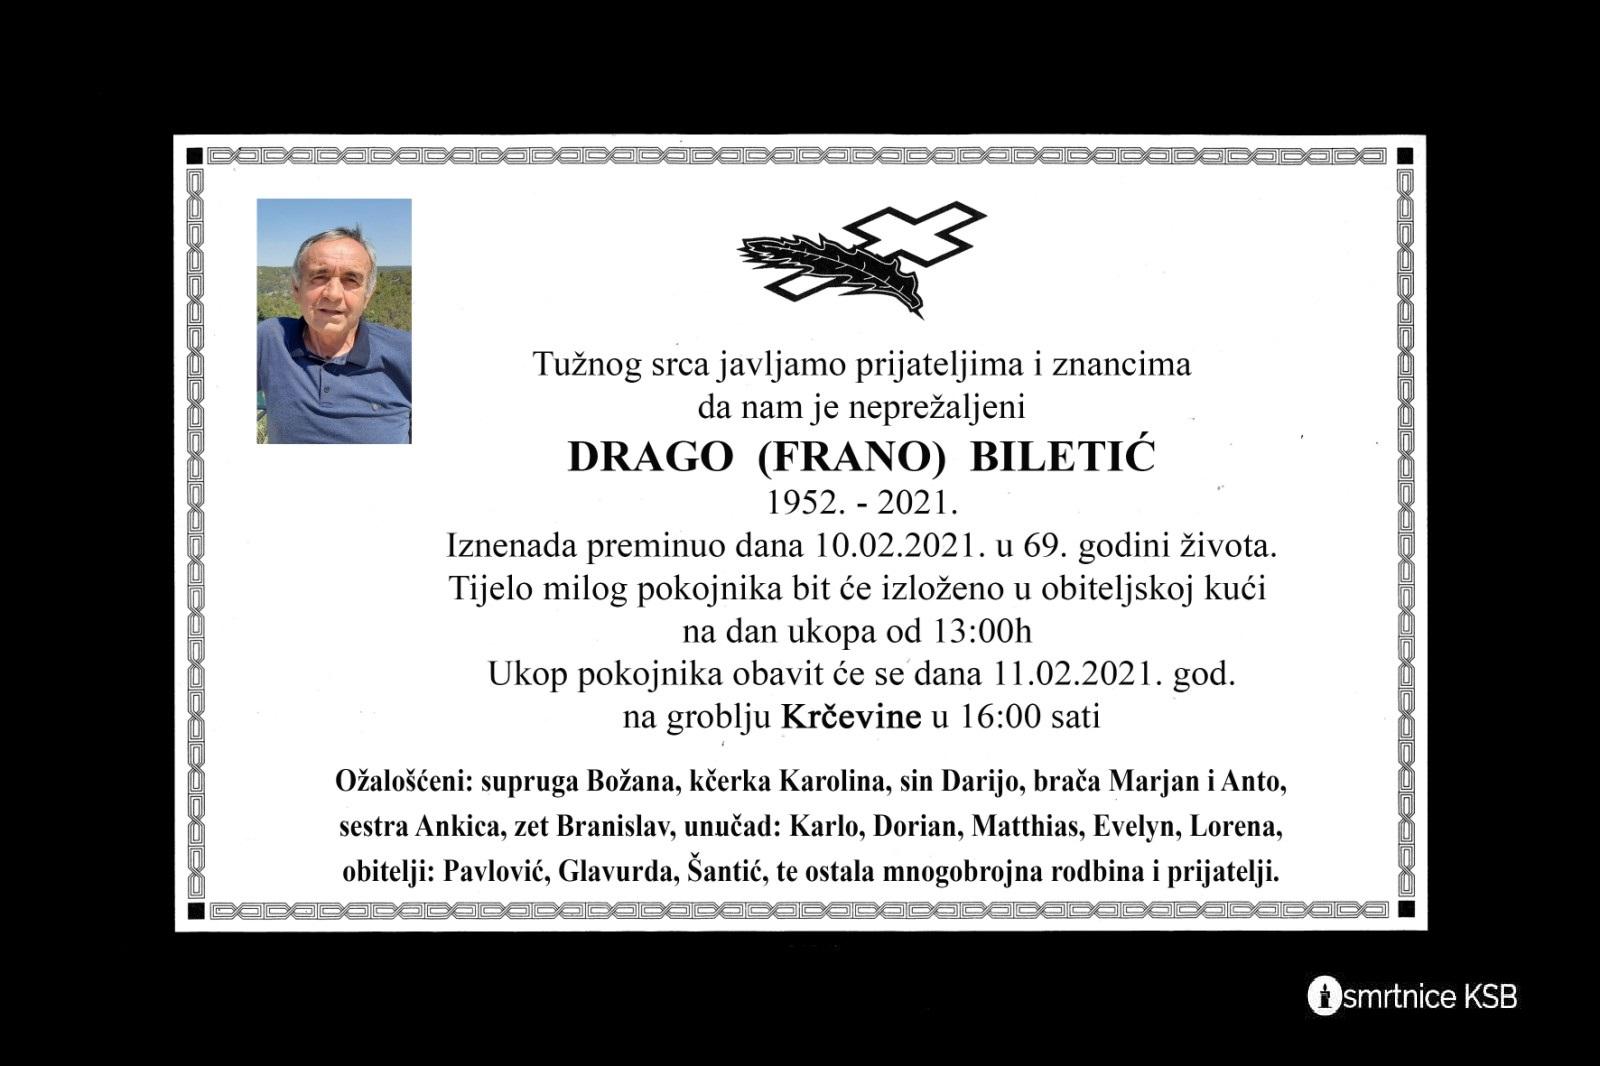 Drago (Frano) Biletić